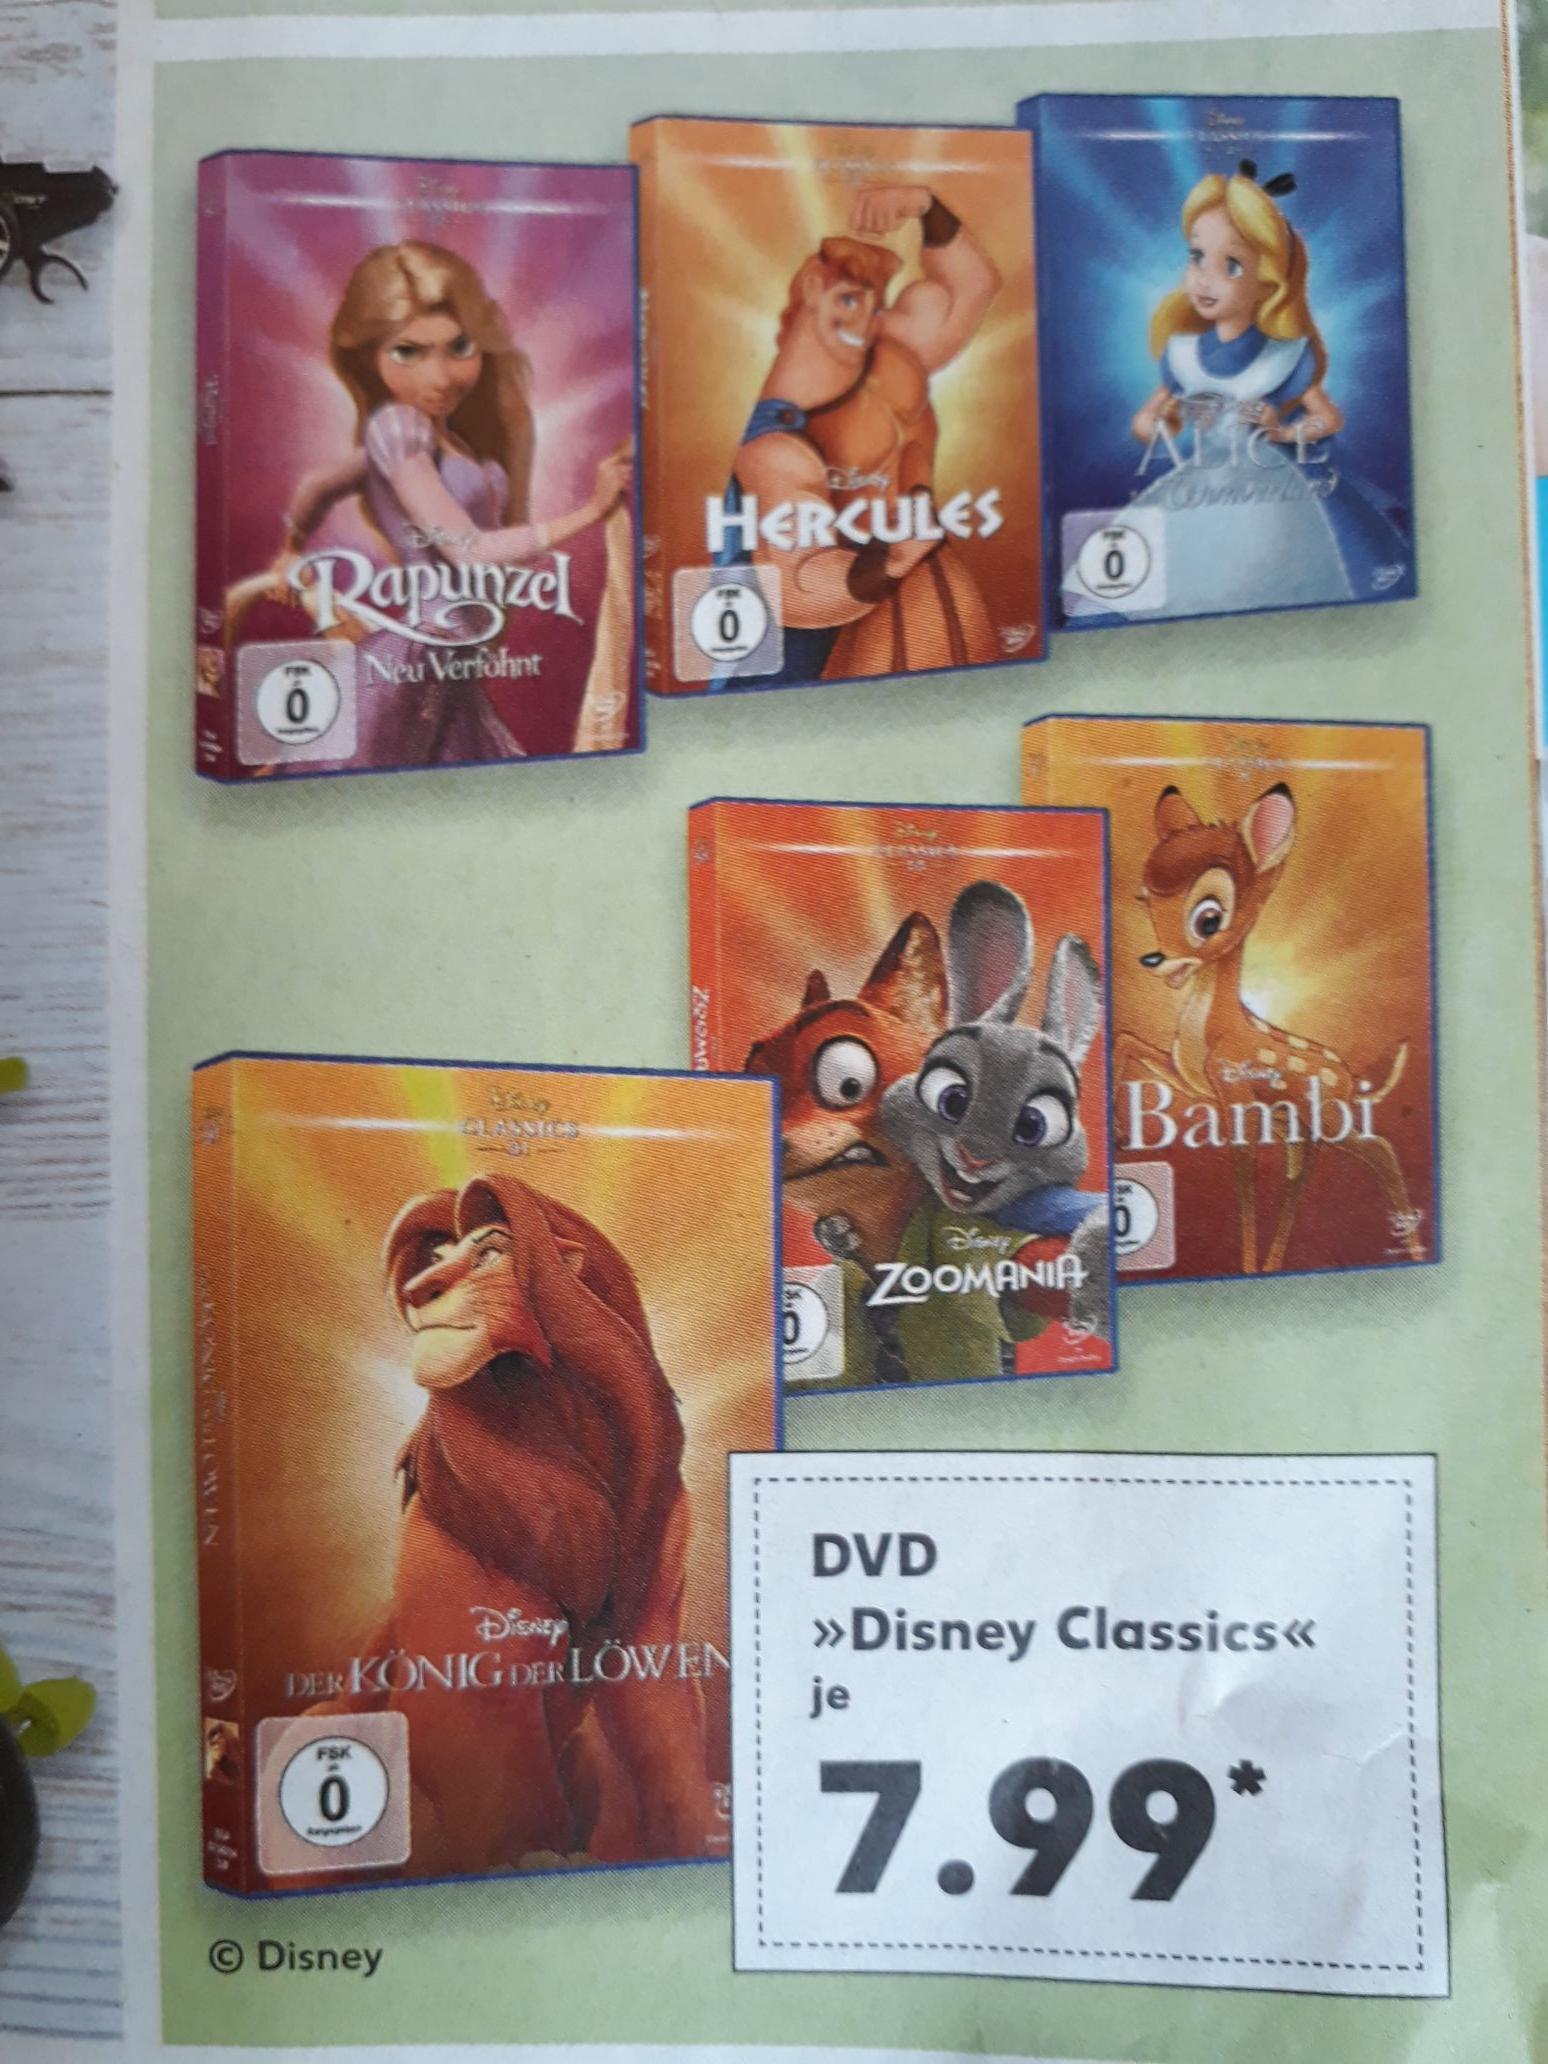 [Kaufland Köln] Zoomania, u. a. Disney Classics, DVD